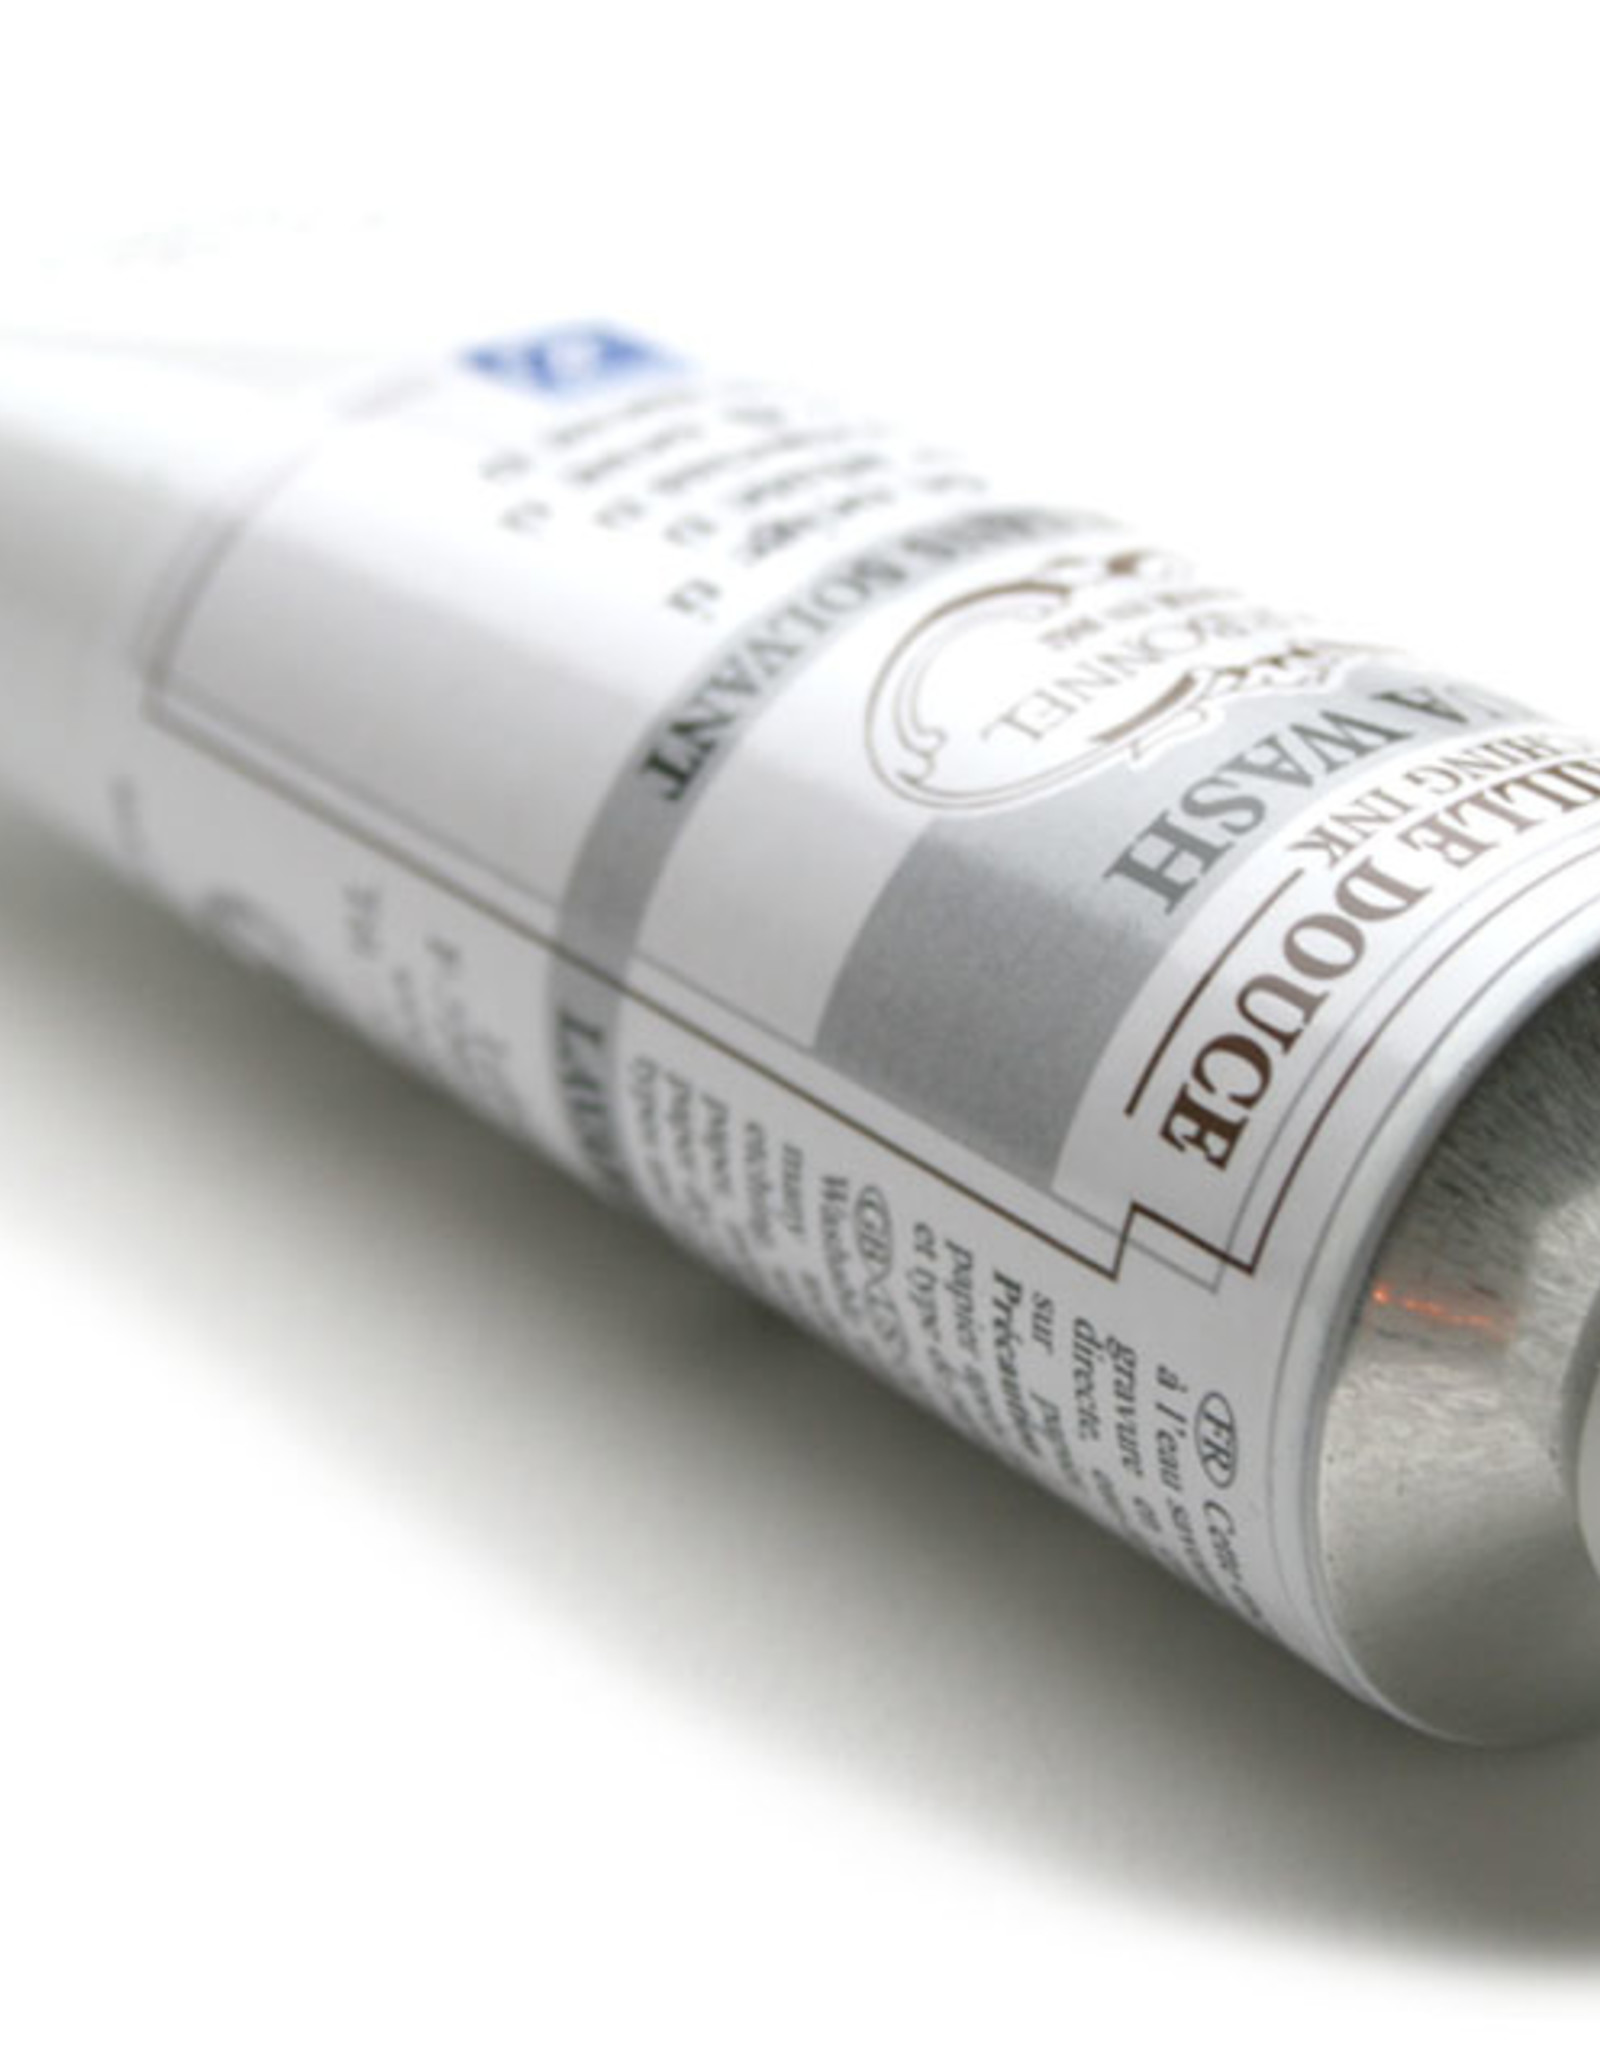 L&B Charbonnel Etsinkt Aqua Wash 60ml Wit Titanium Dekkend / Titanium White Serie 2 no 916